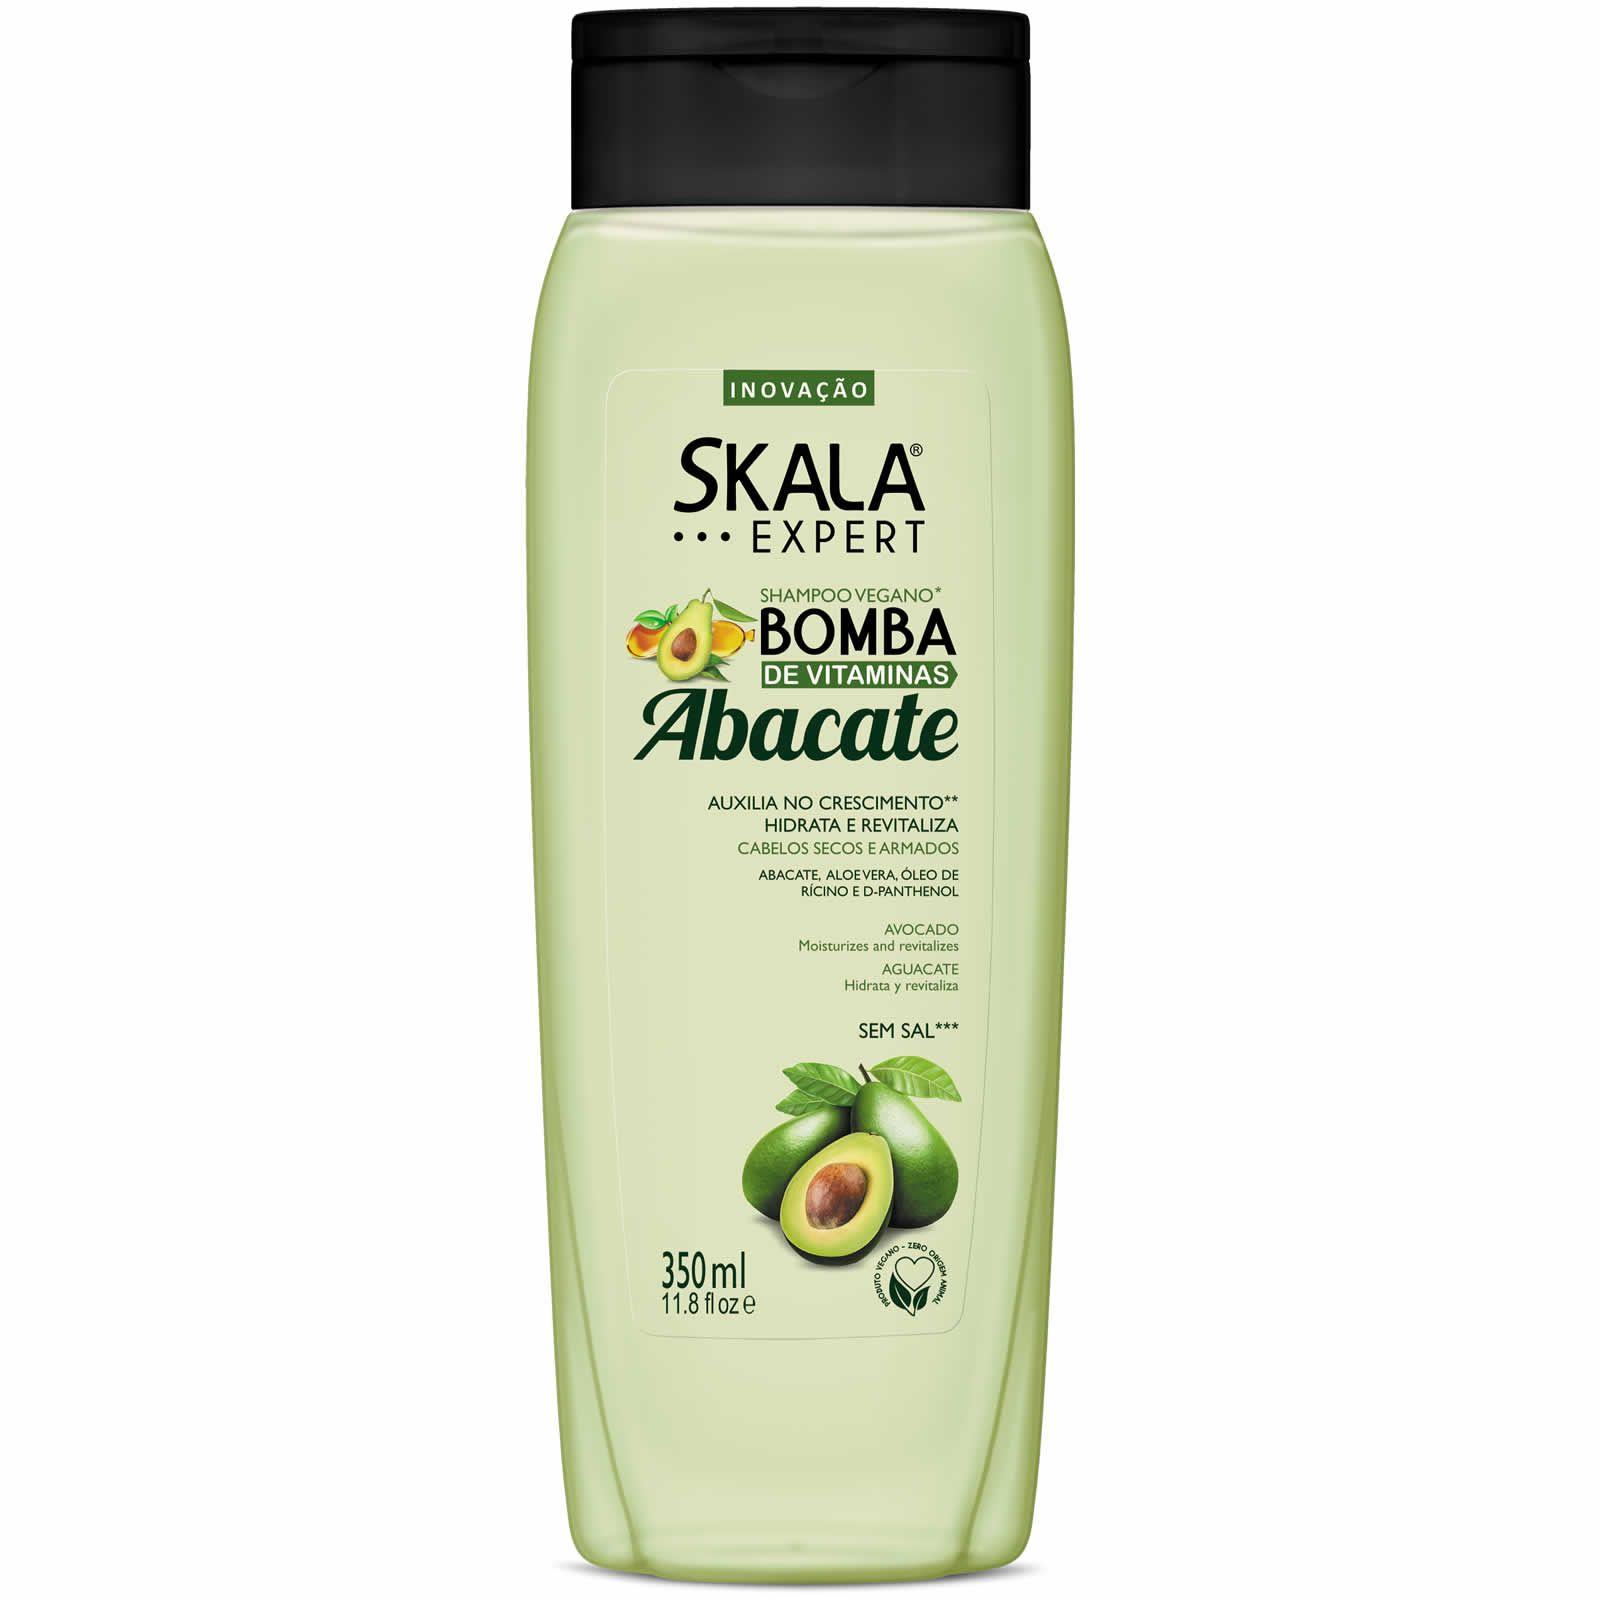 Shampoo Bomba de Vitaminas Abacate